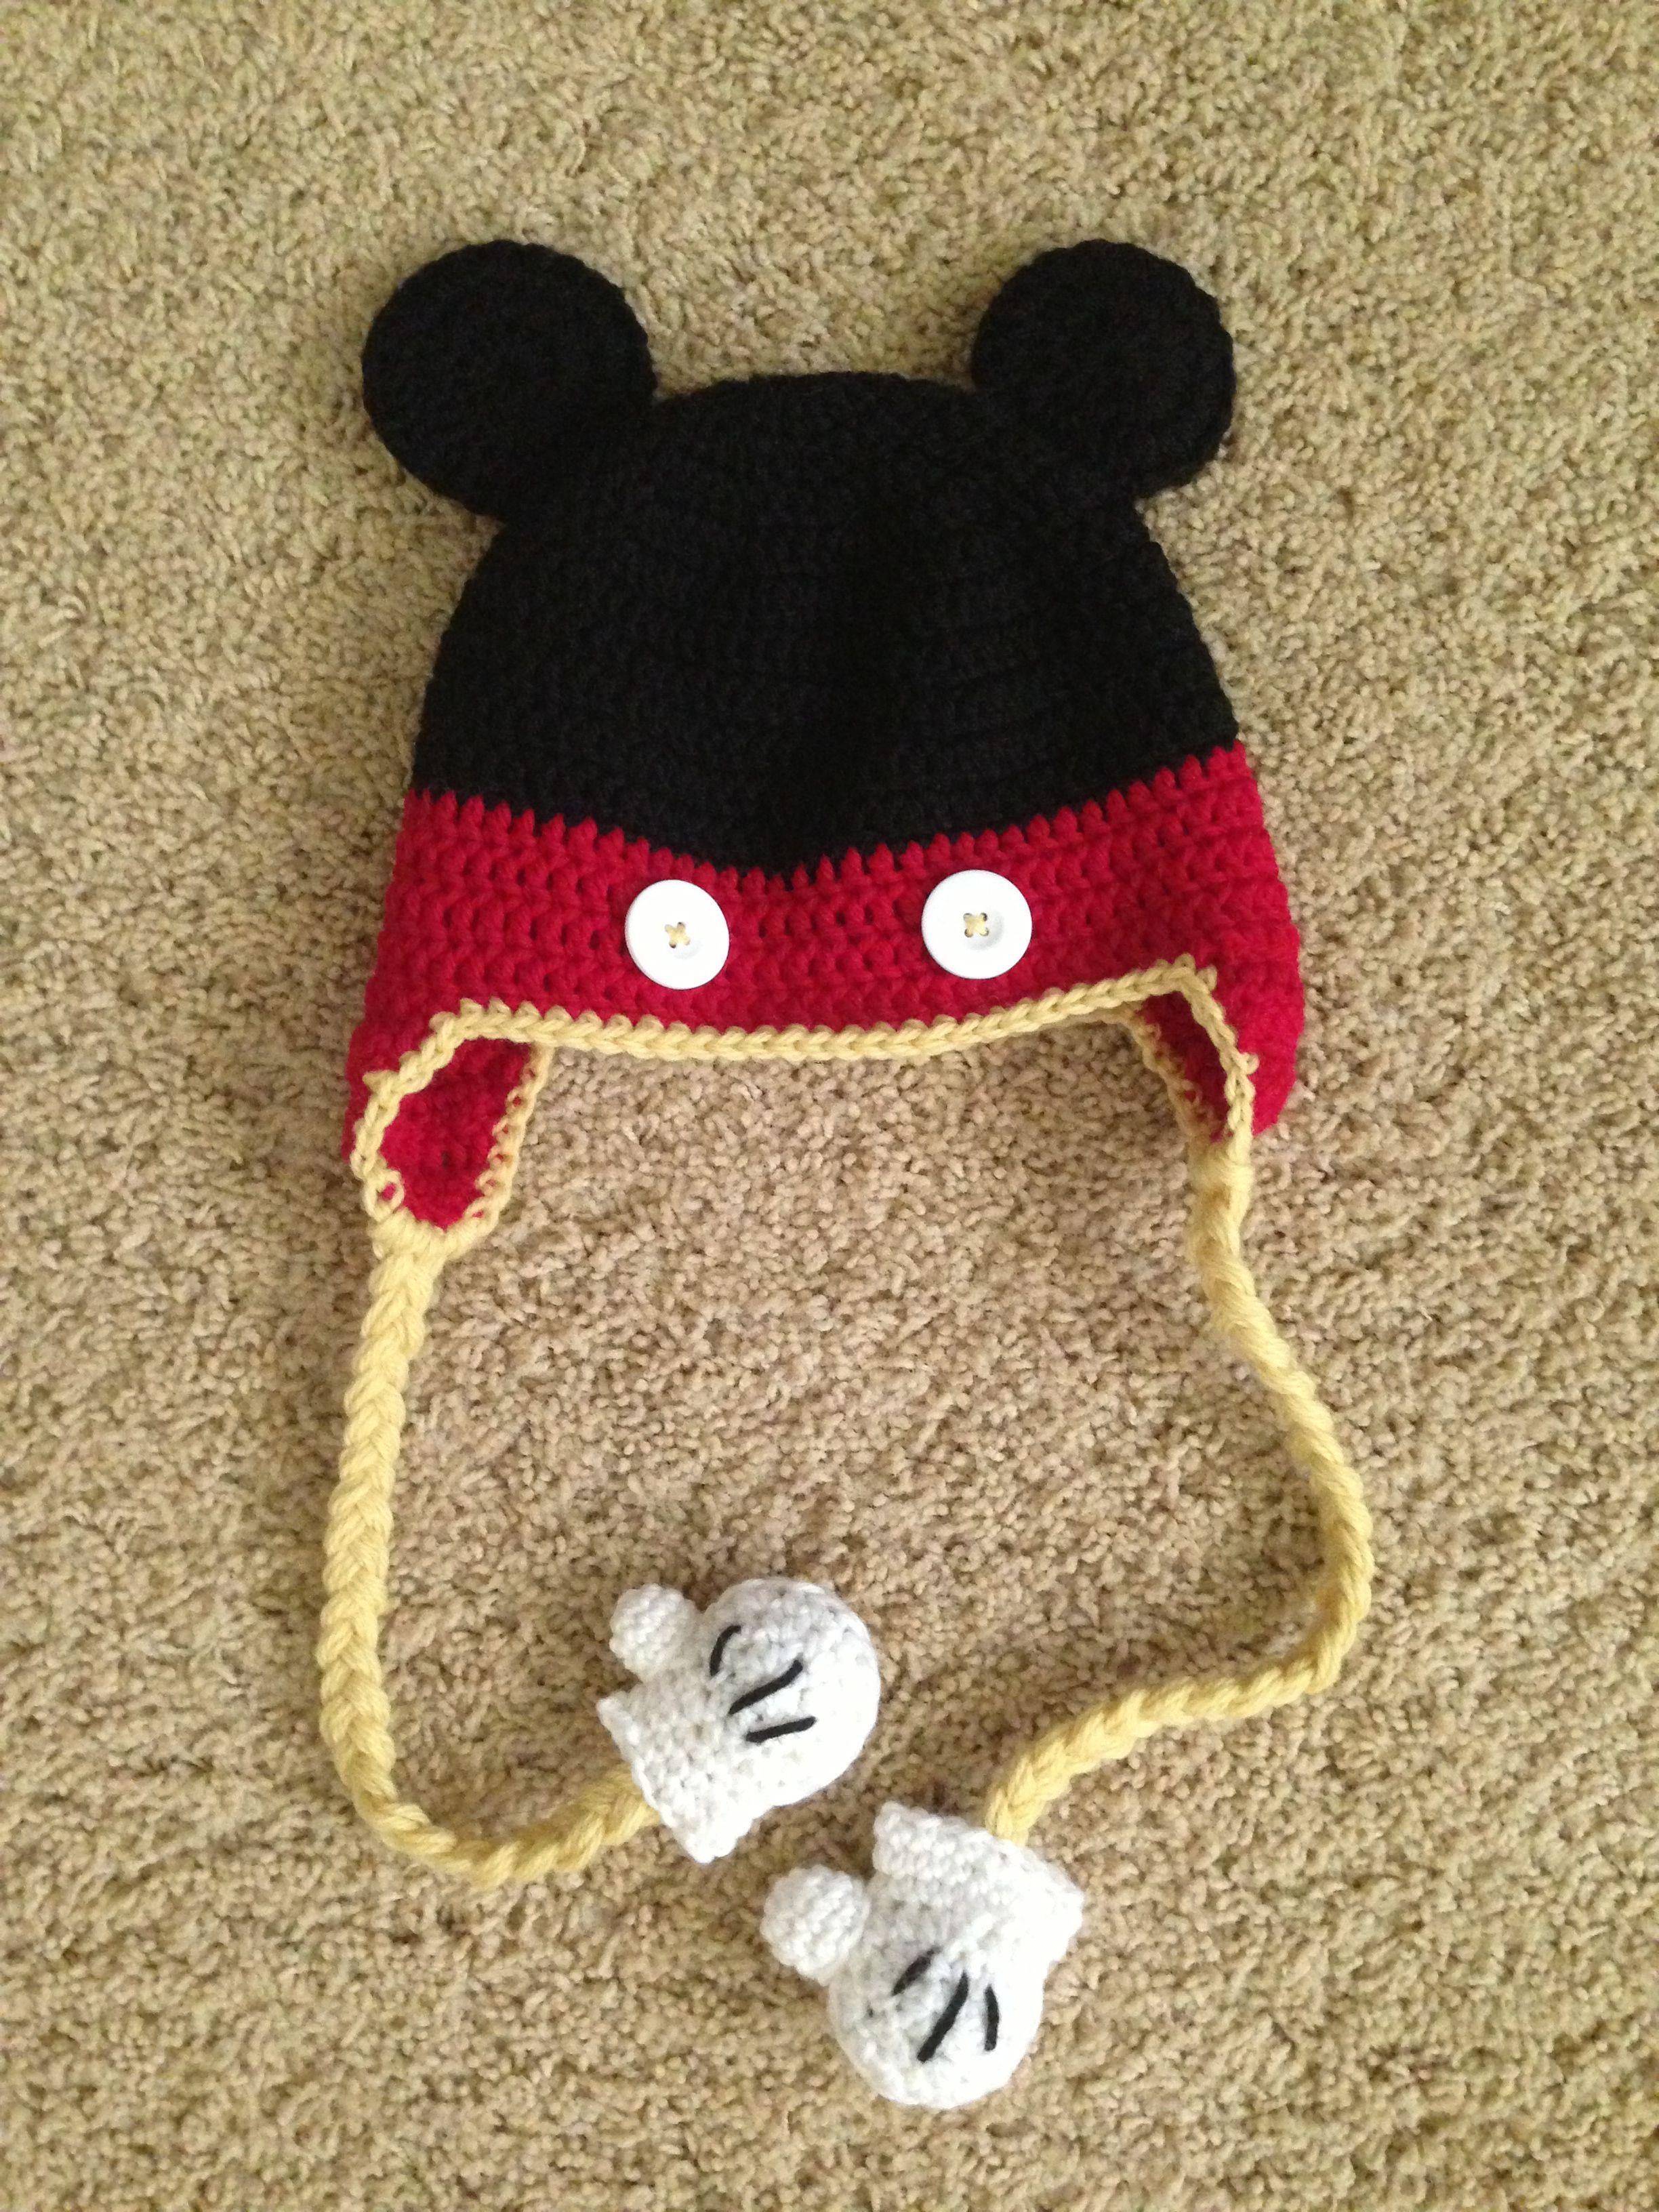 Mickey Mouse Knitted Hat Pattern : Crochet Mickey Mouse hat Gorros de bebe Pinterest